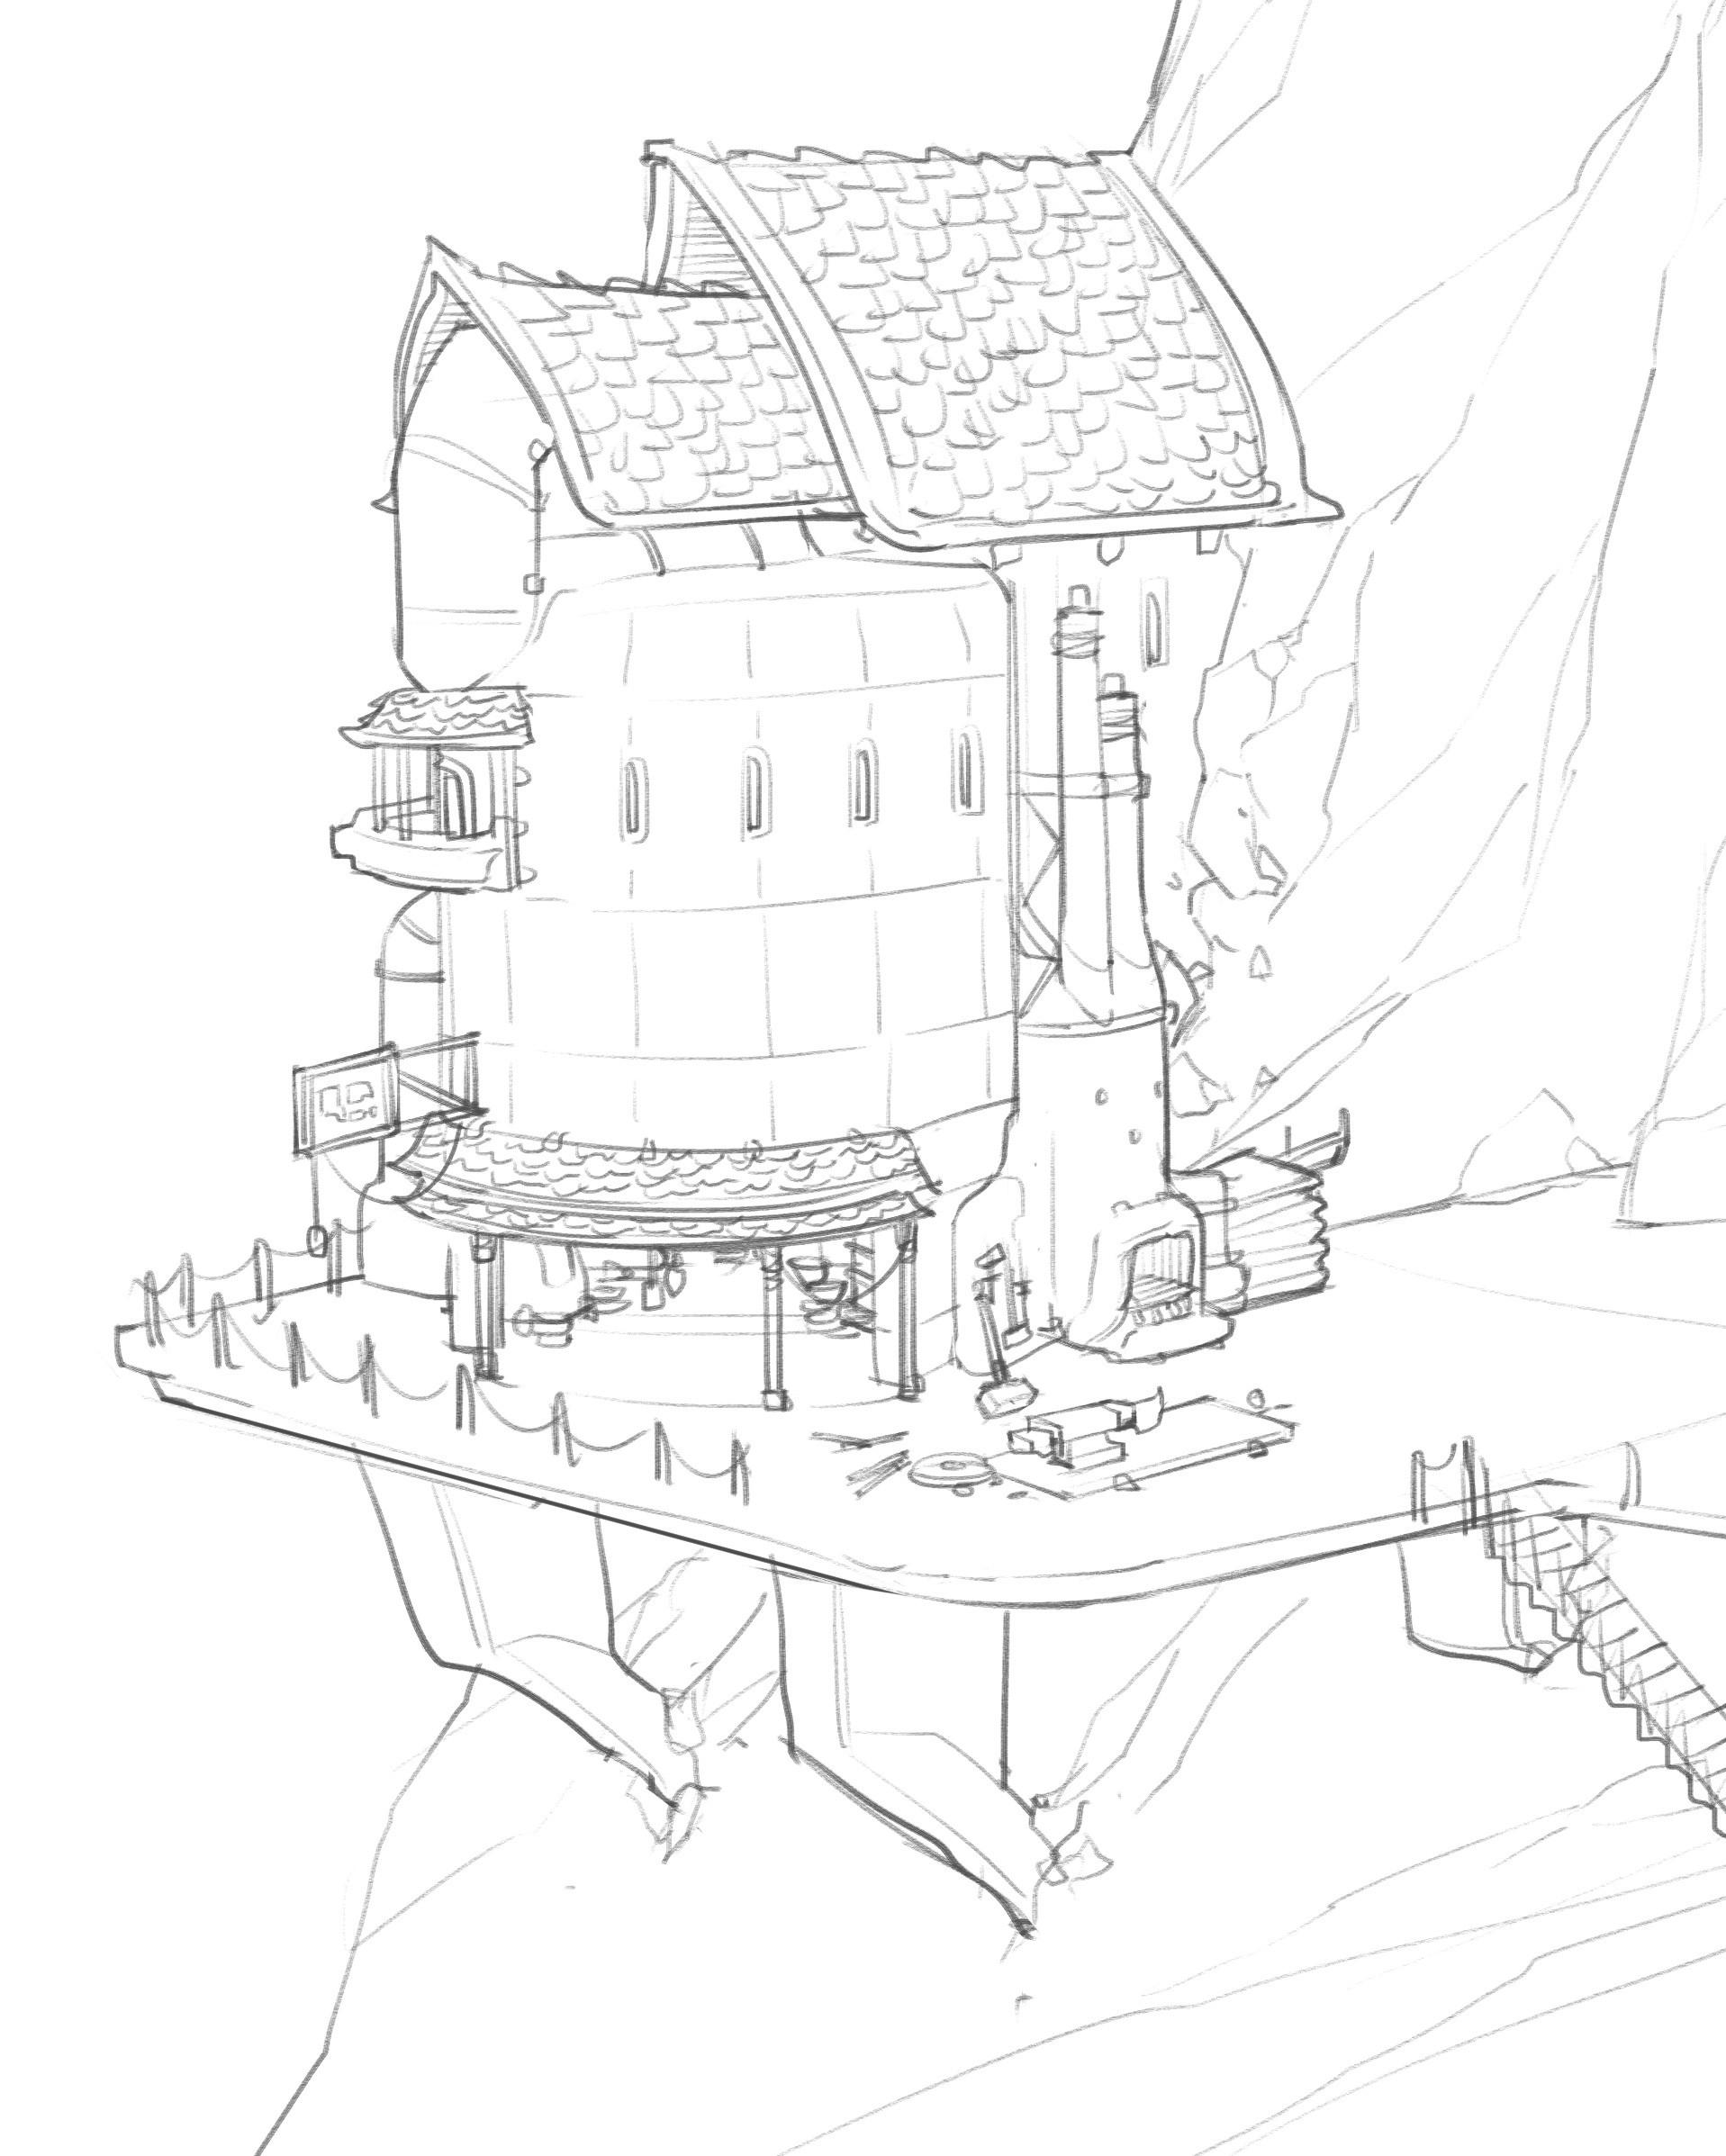 ArtStation - World Building Days 4-5 : Temples and Slugs